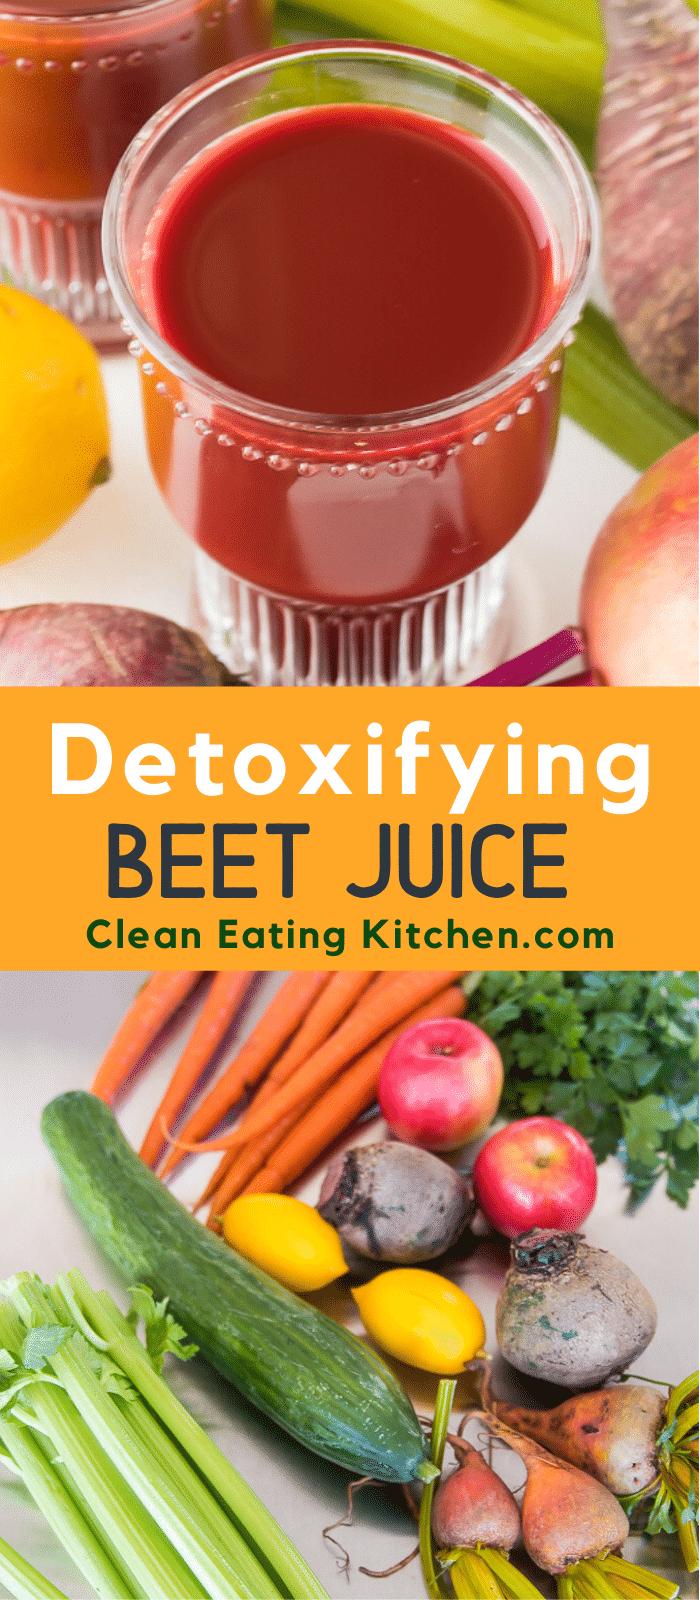 detoxifying beet juice recipe